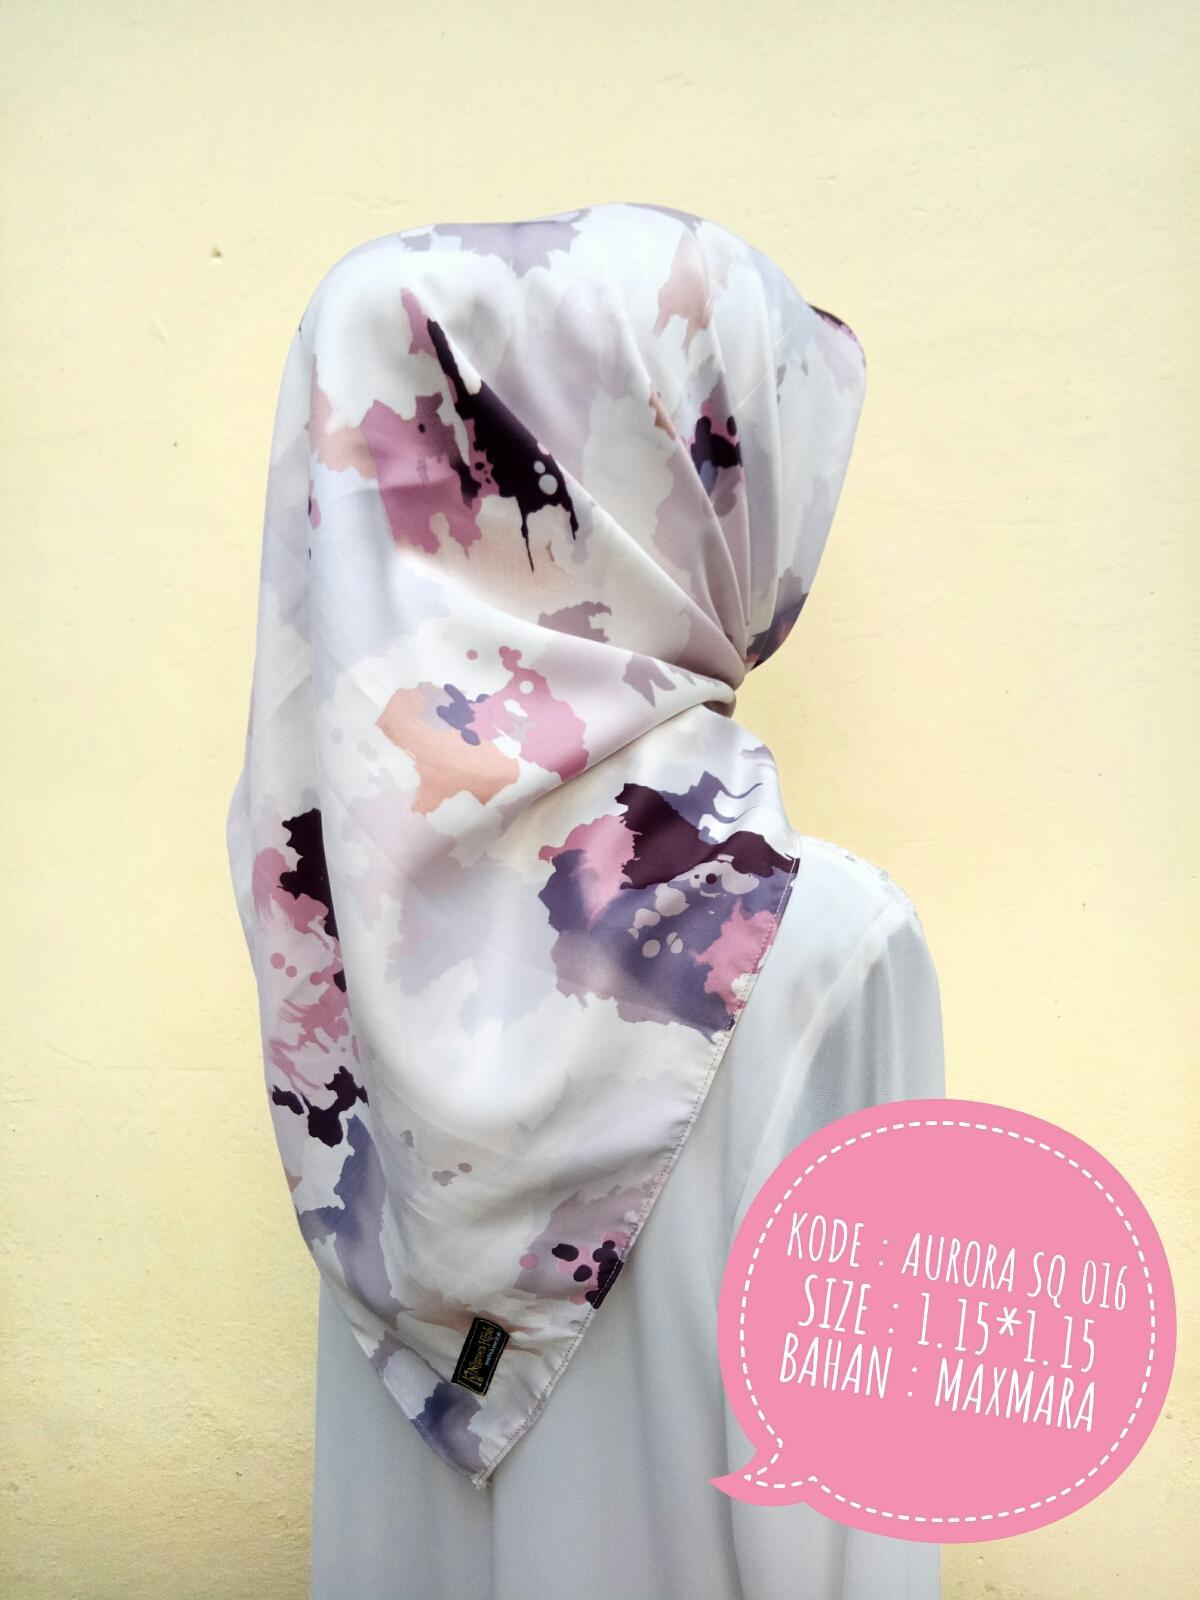 Aurora Madini SQ Jilbab Motif Segi Empat Segi Tiga Kerudung Kantor Pesta Premium Murah Kualitas Butik by Nggemesin Hijab